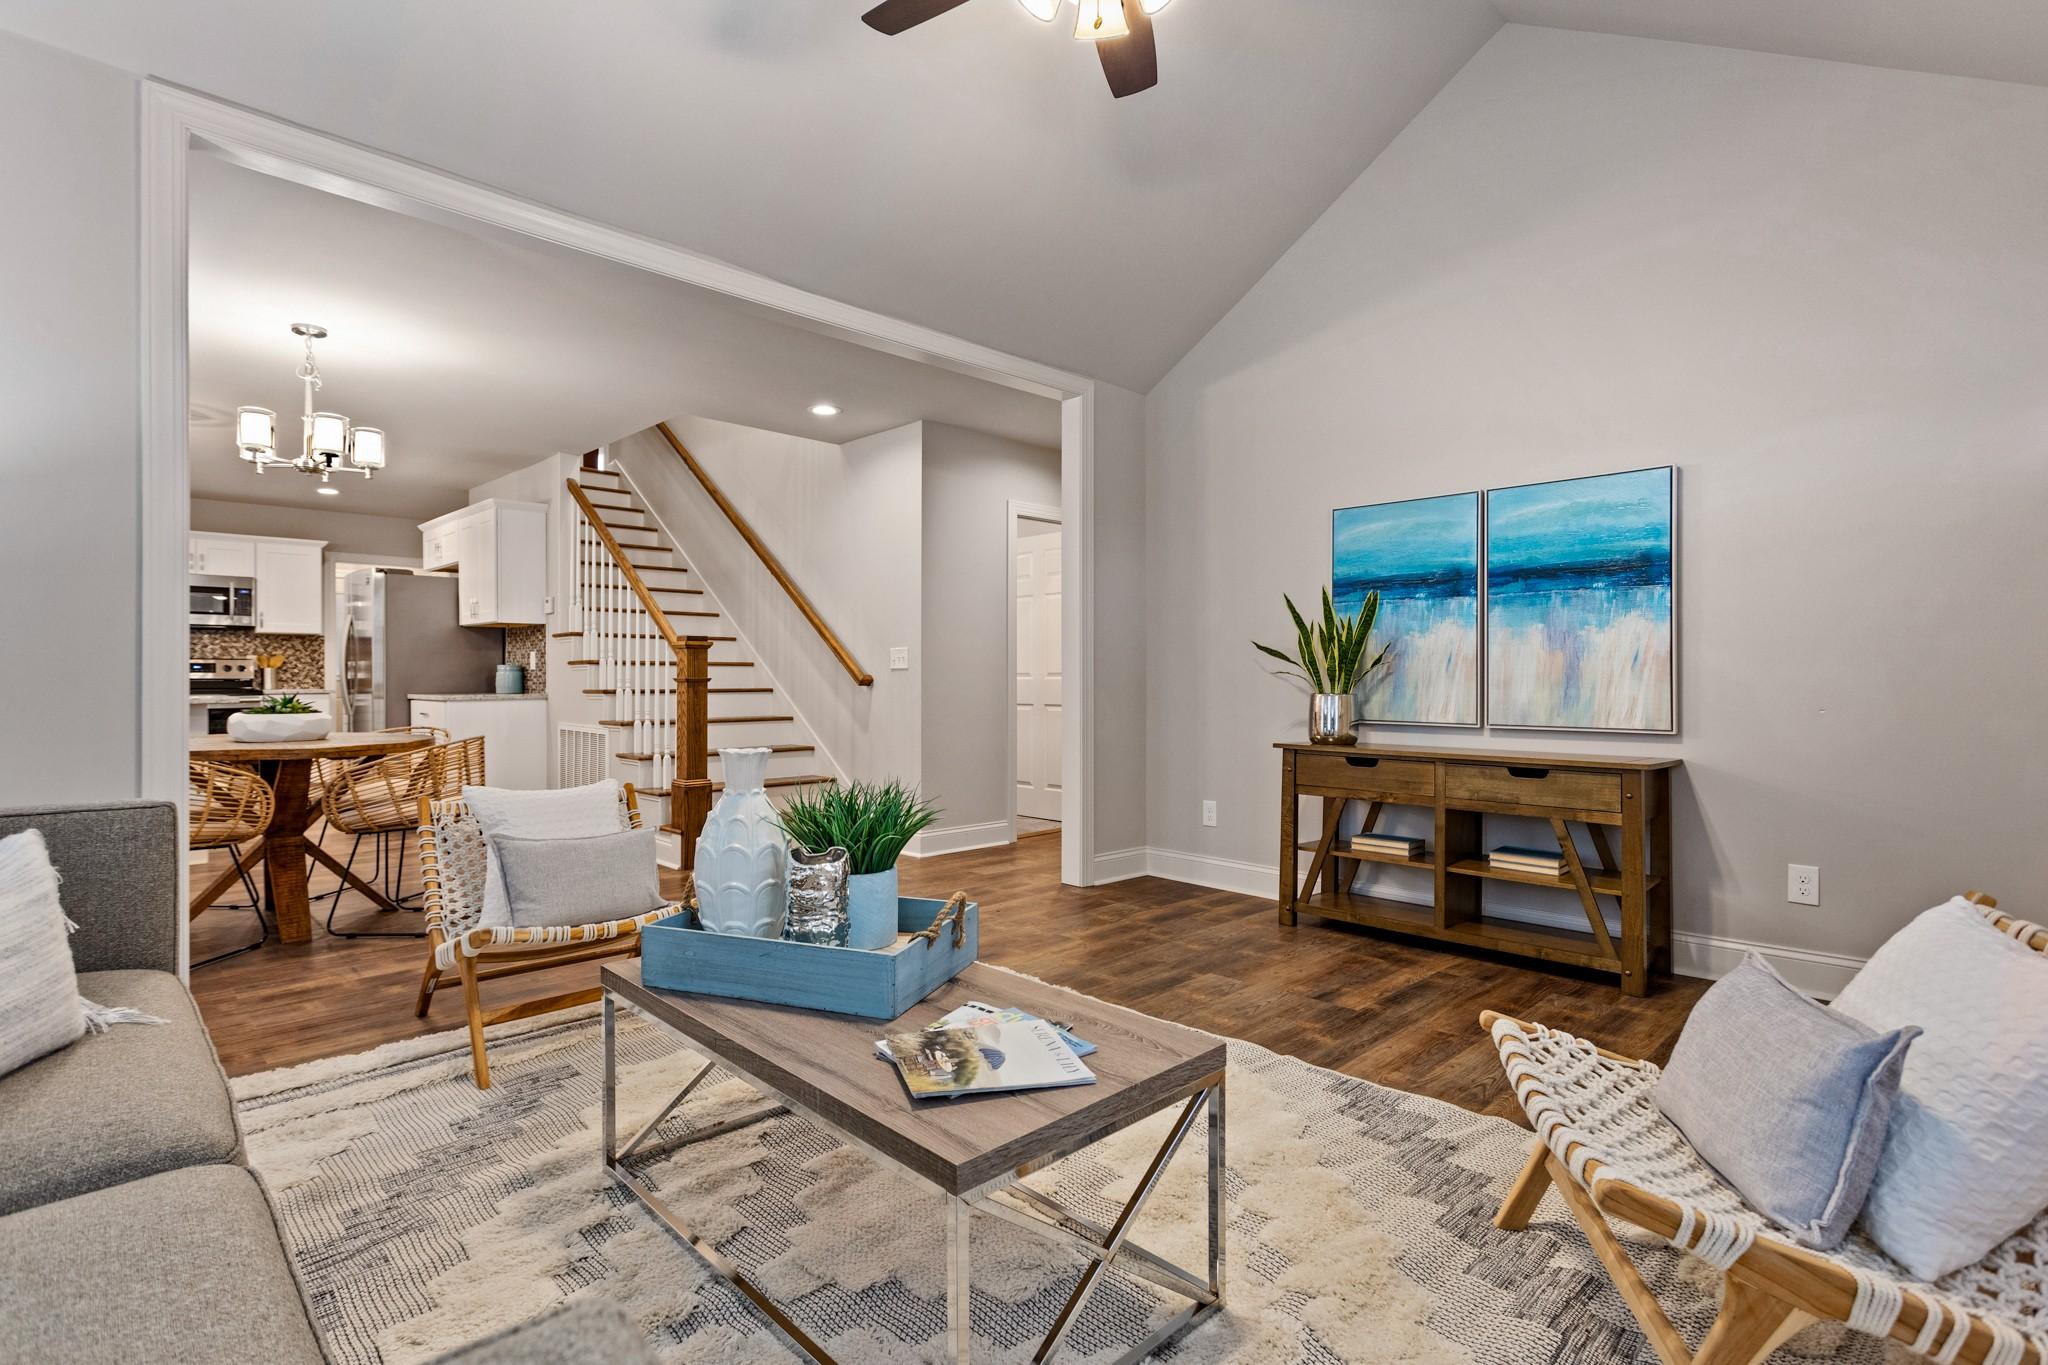 901 Chickasaw Ave, Nashville, TN 37207 - Nashville, TN real estate listing